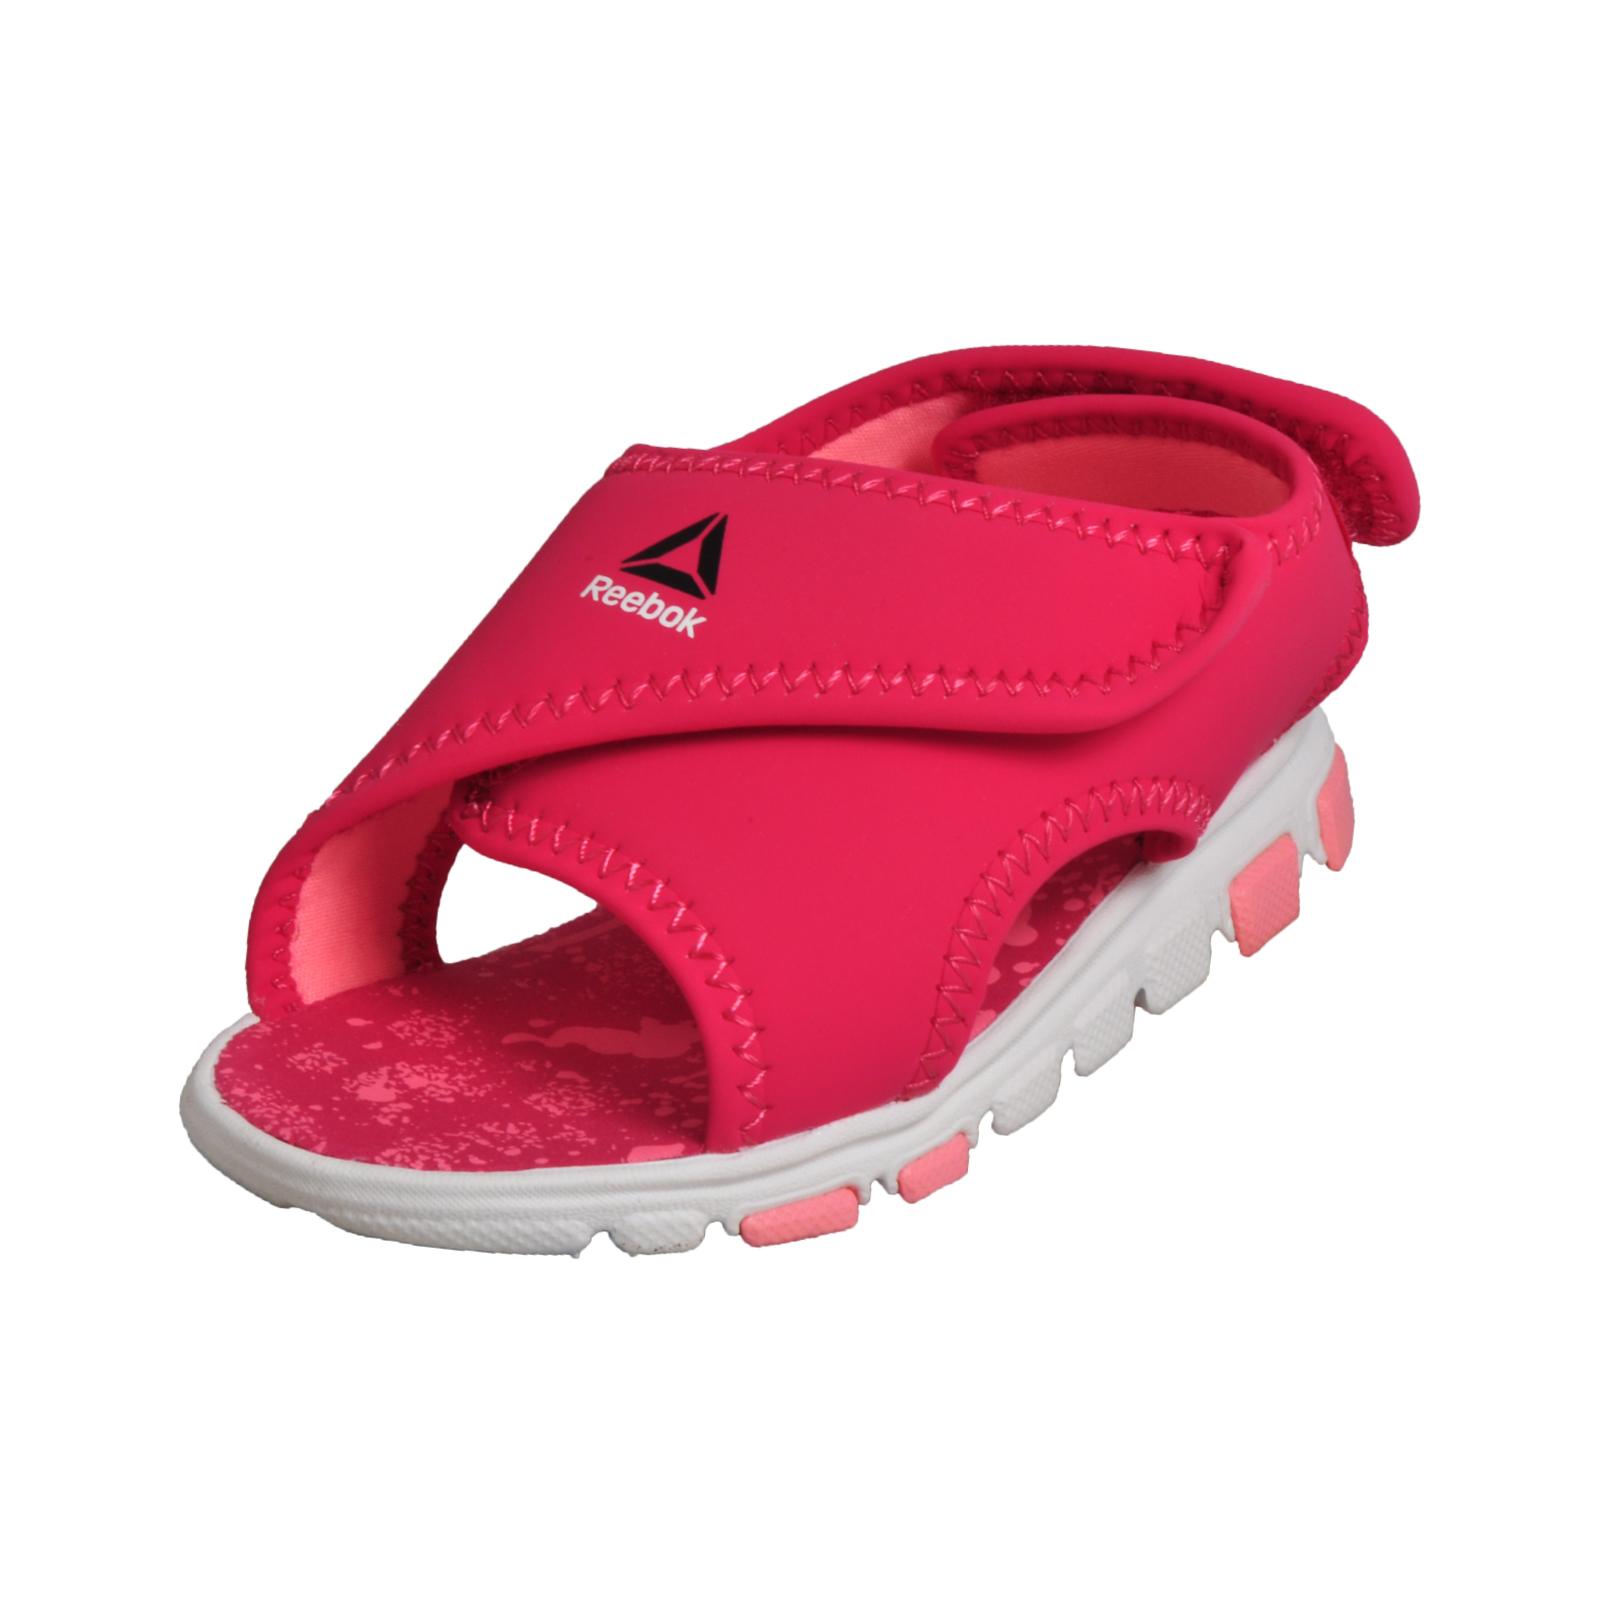 5b62cbe4d124 Details about Reebok Wave Glider Girls Infants Toddlers Summer Sandals Pink